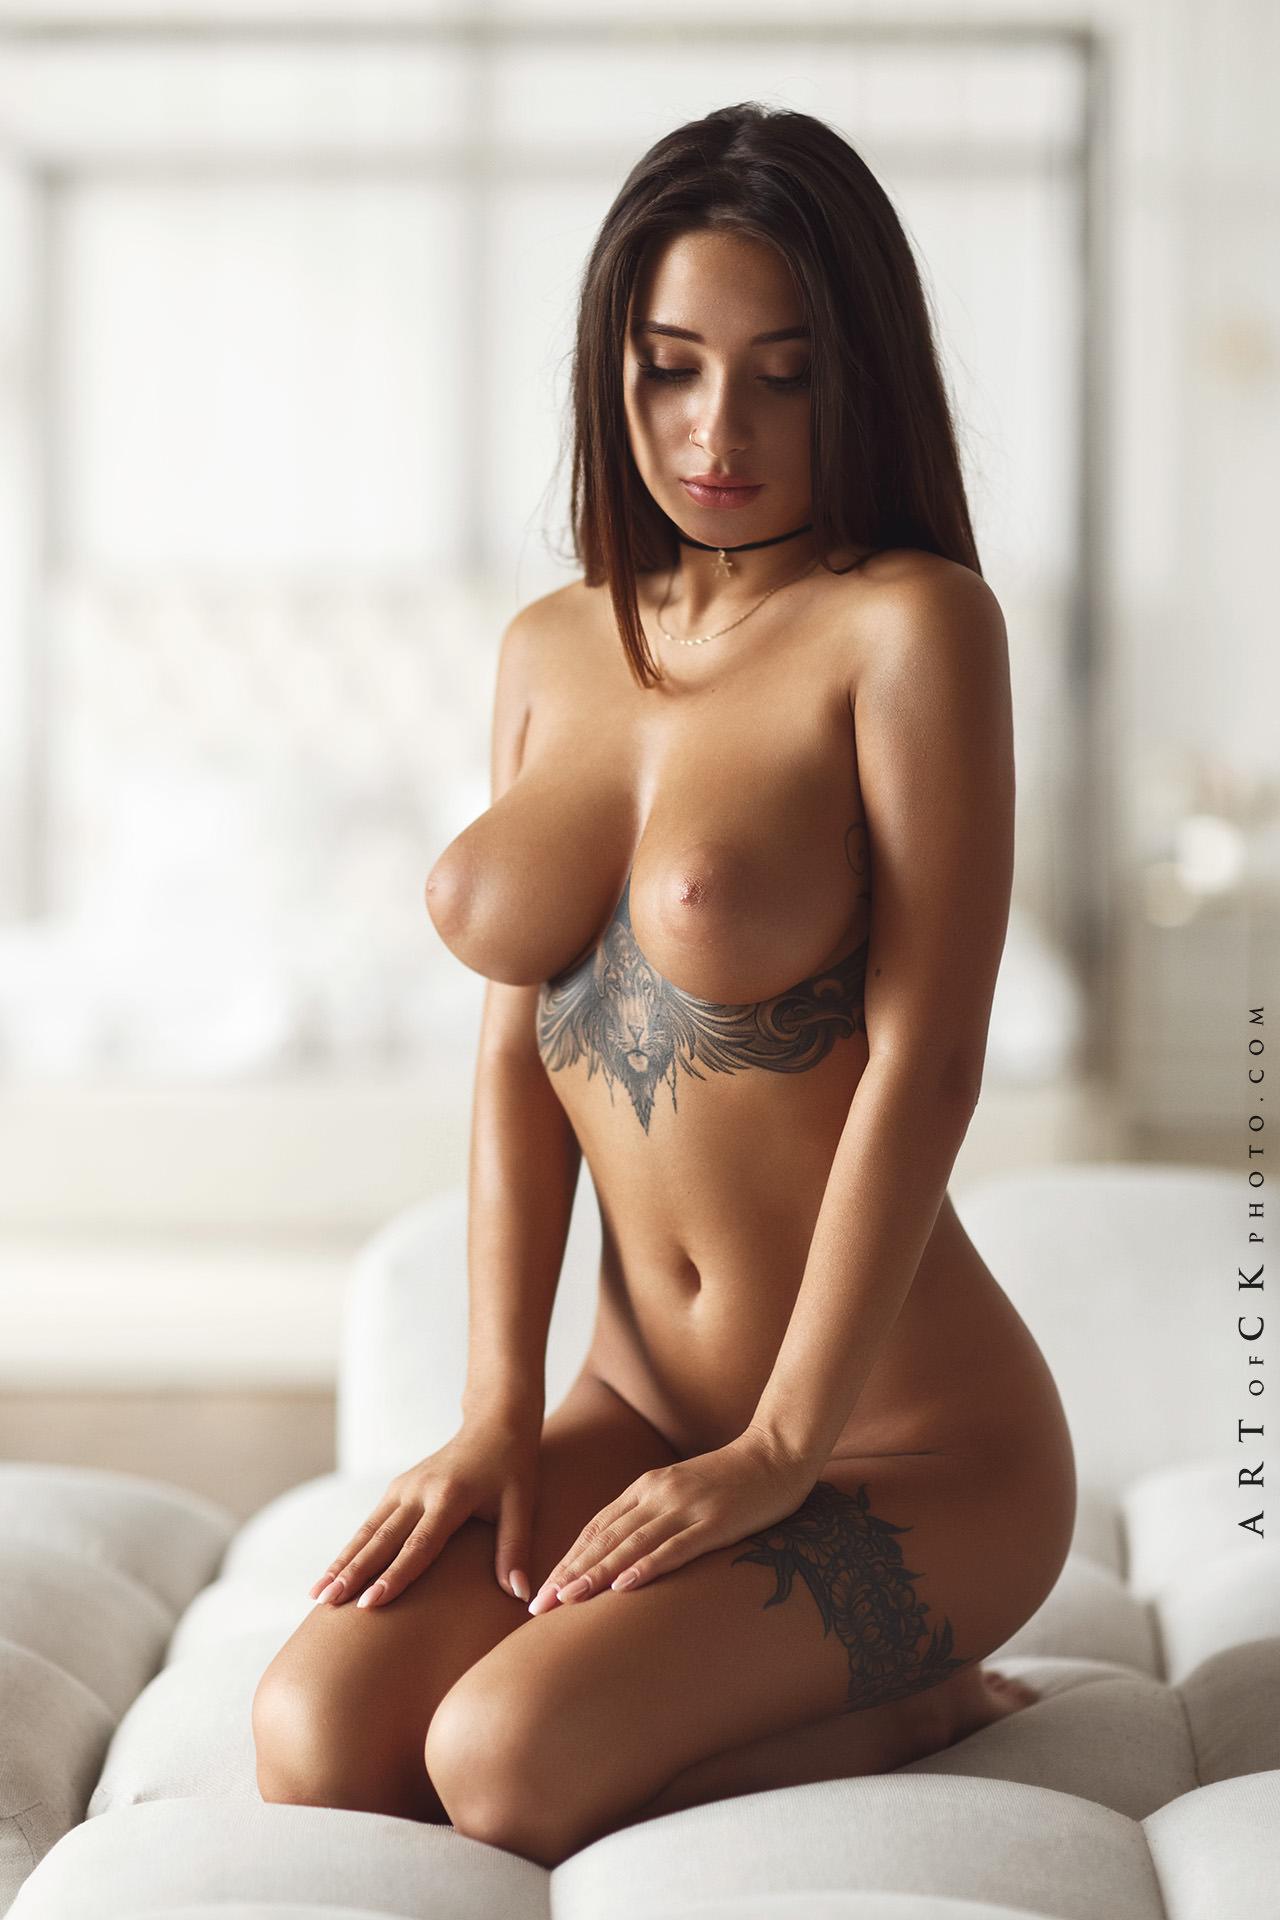 Sexy Kristina Shcherbinina naked (75 photo), Pussy, Leaked, Selfie, braless 2015